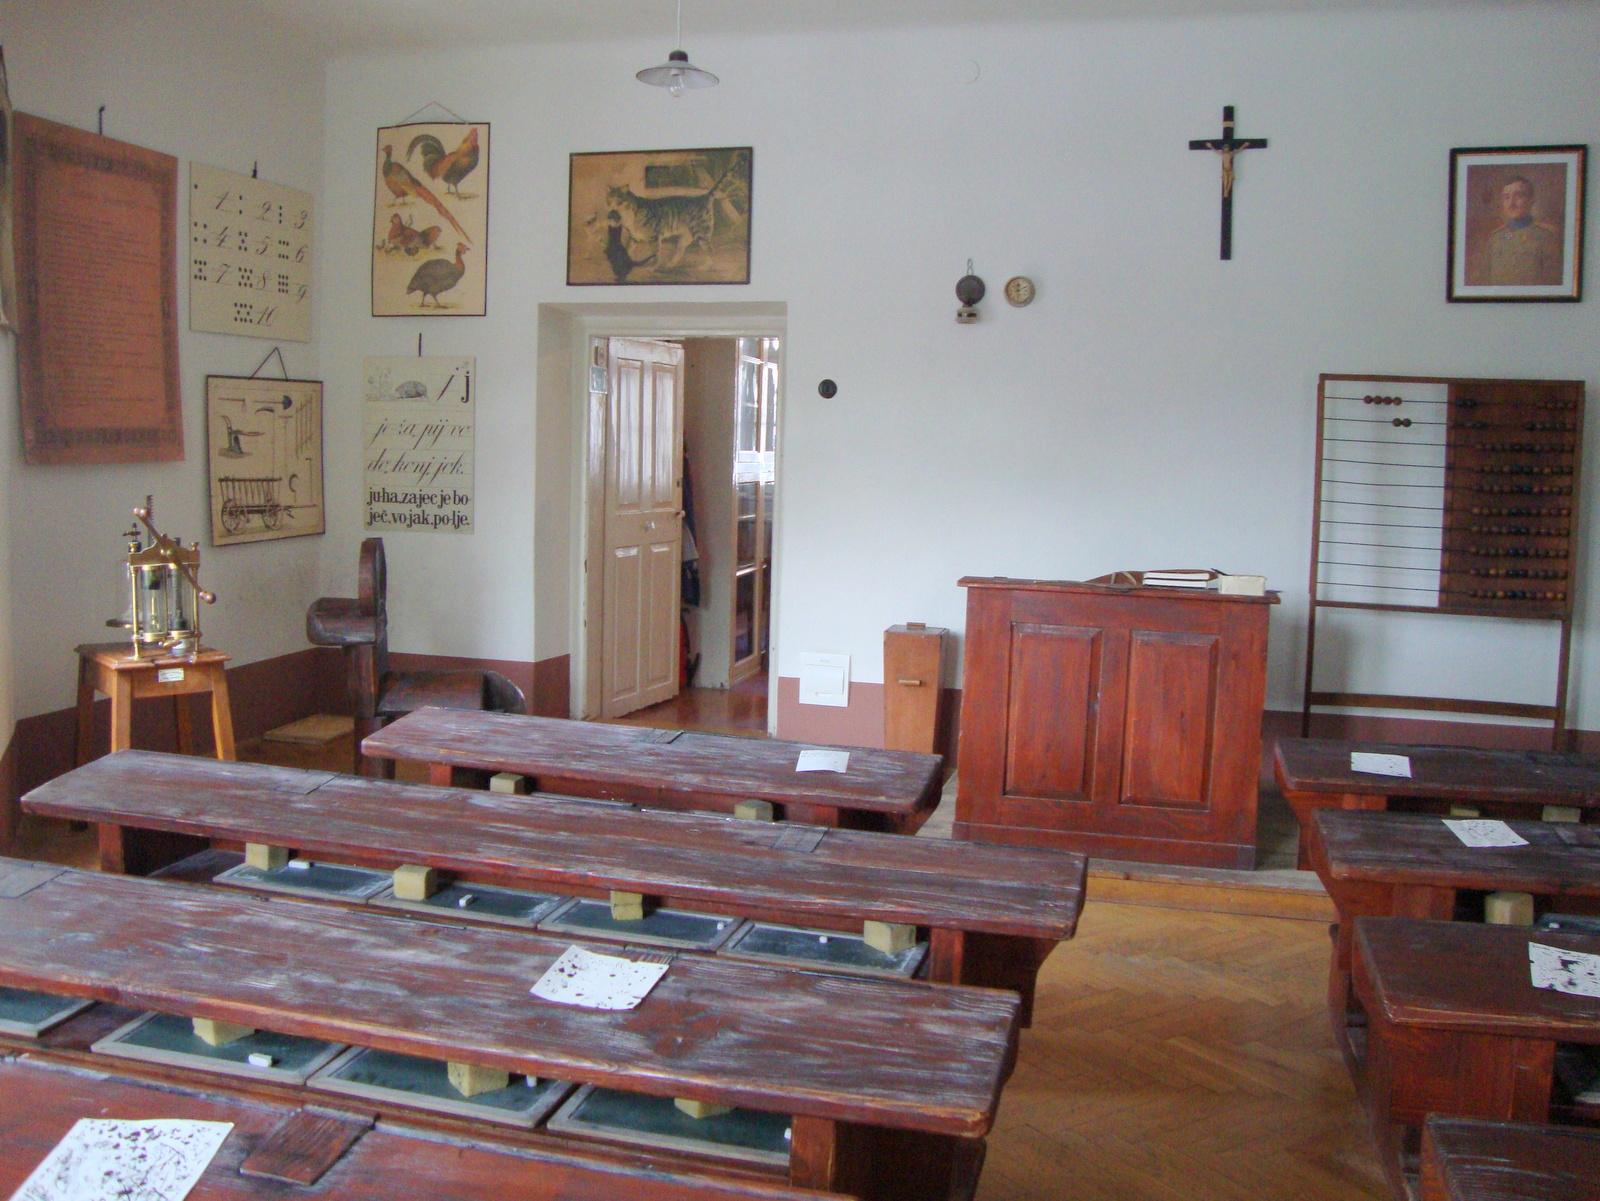 Šolski muzej učilnica nekoč